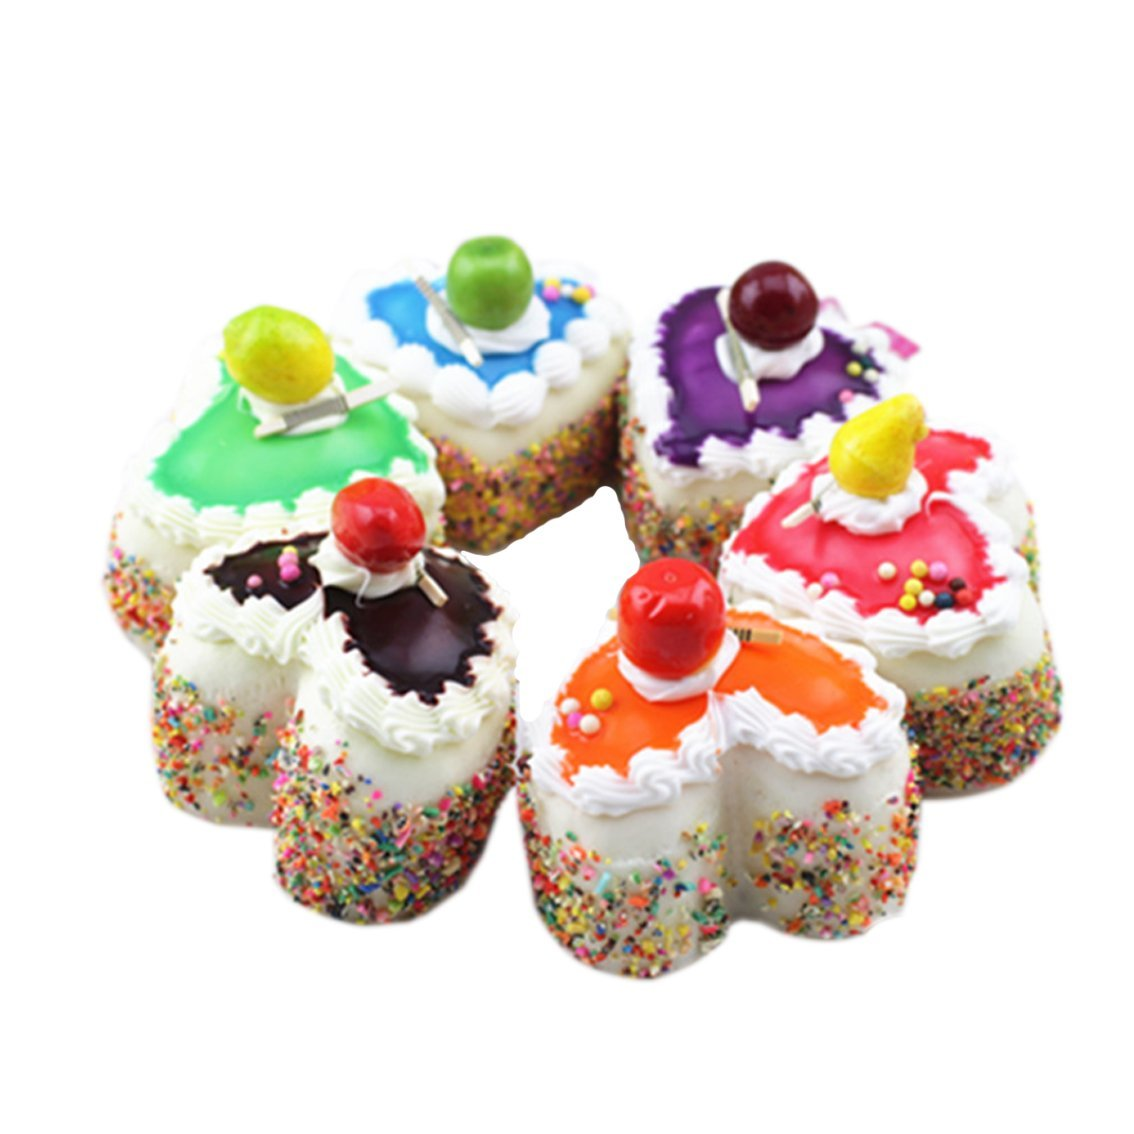 Eworld - Squishy Heart Cake Fridge Magnet - Jumbo Slow Rising Kawaii Dessert Soft Sponge Cake Cute Hand Pillow Cream Scented Squeeze Gift Hand Wrist Stress Toy